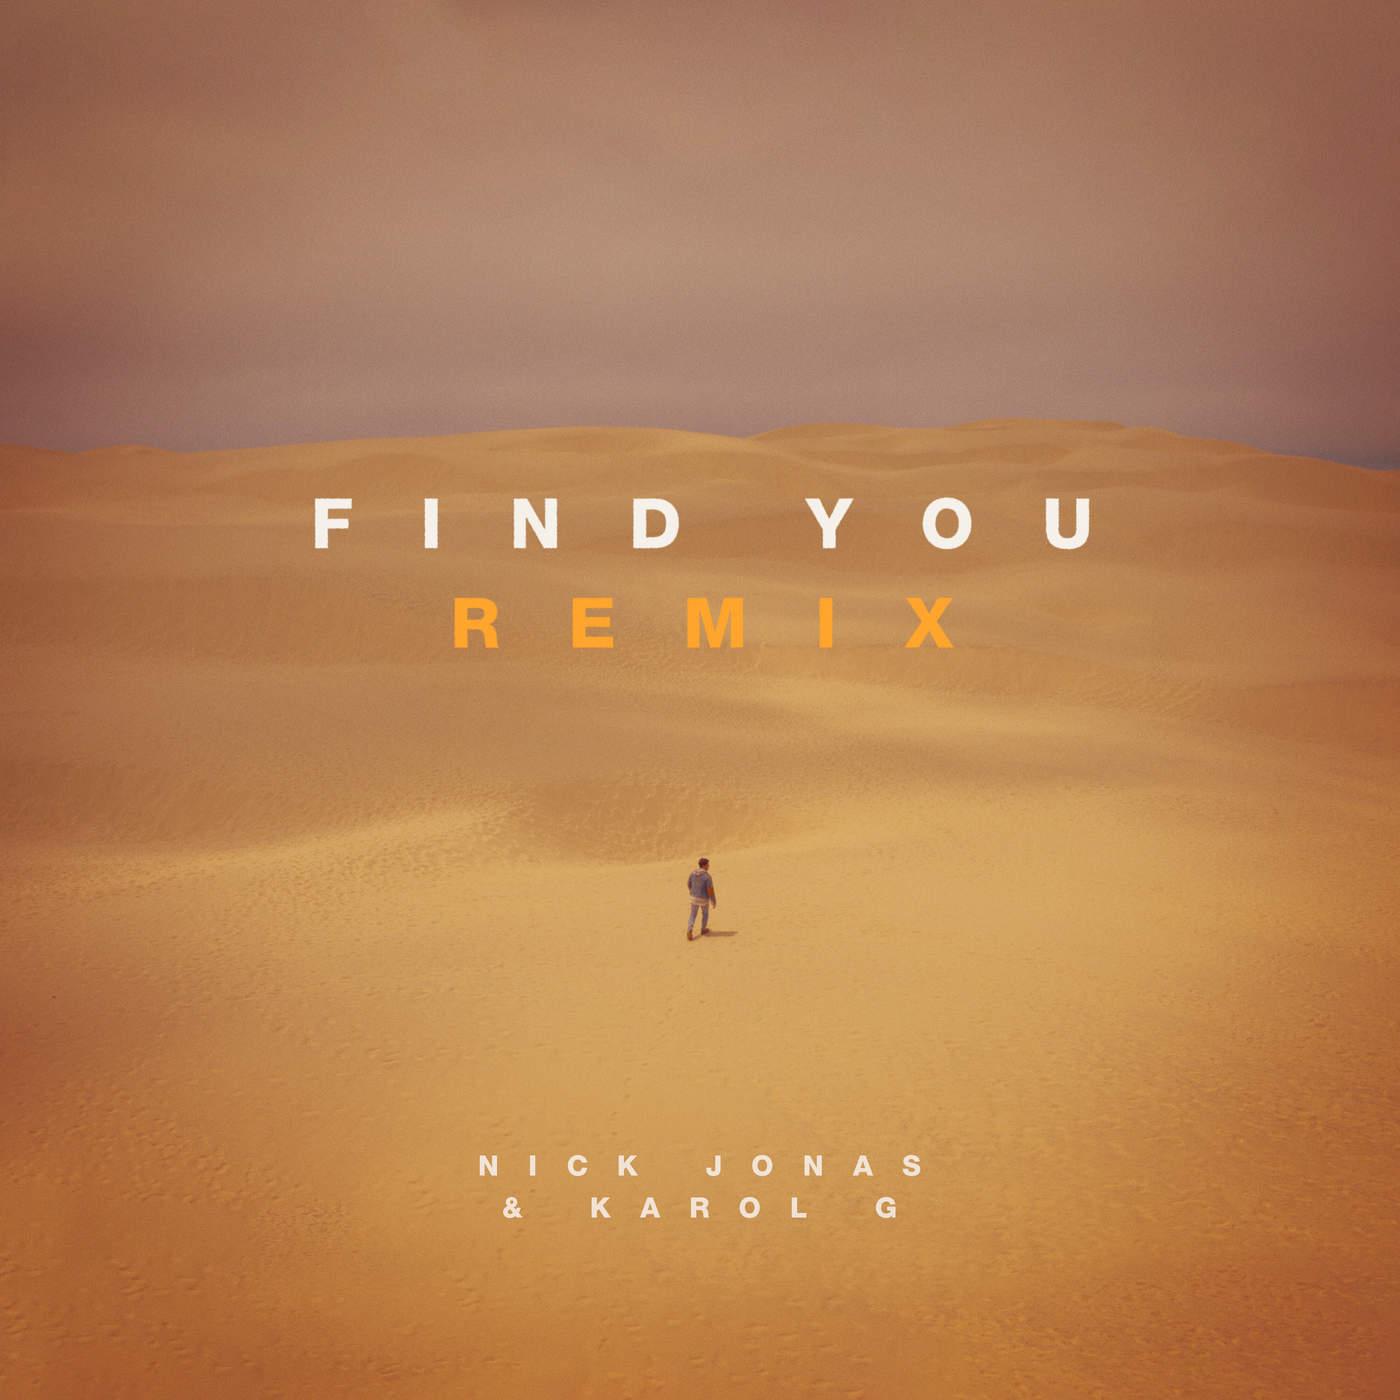 Nick Jonas & Karol G - Find You (Remix) - Single